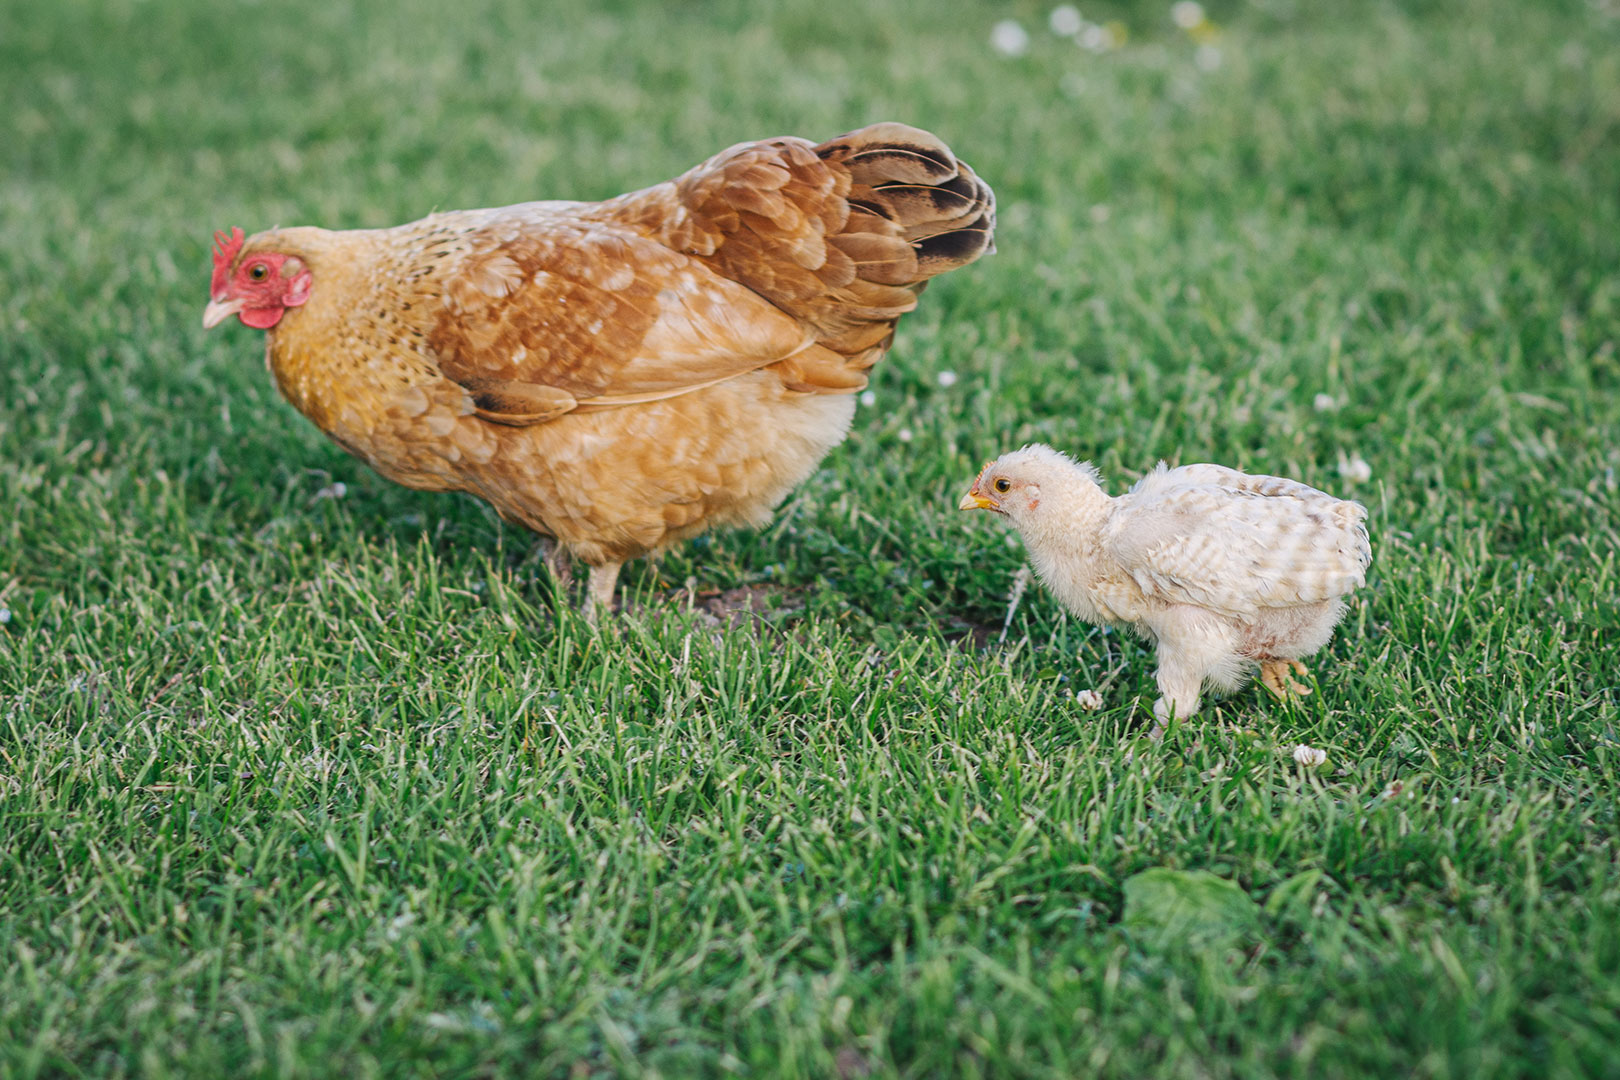 Huhn mit Küken in Utlandshörn